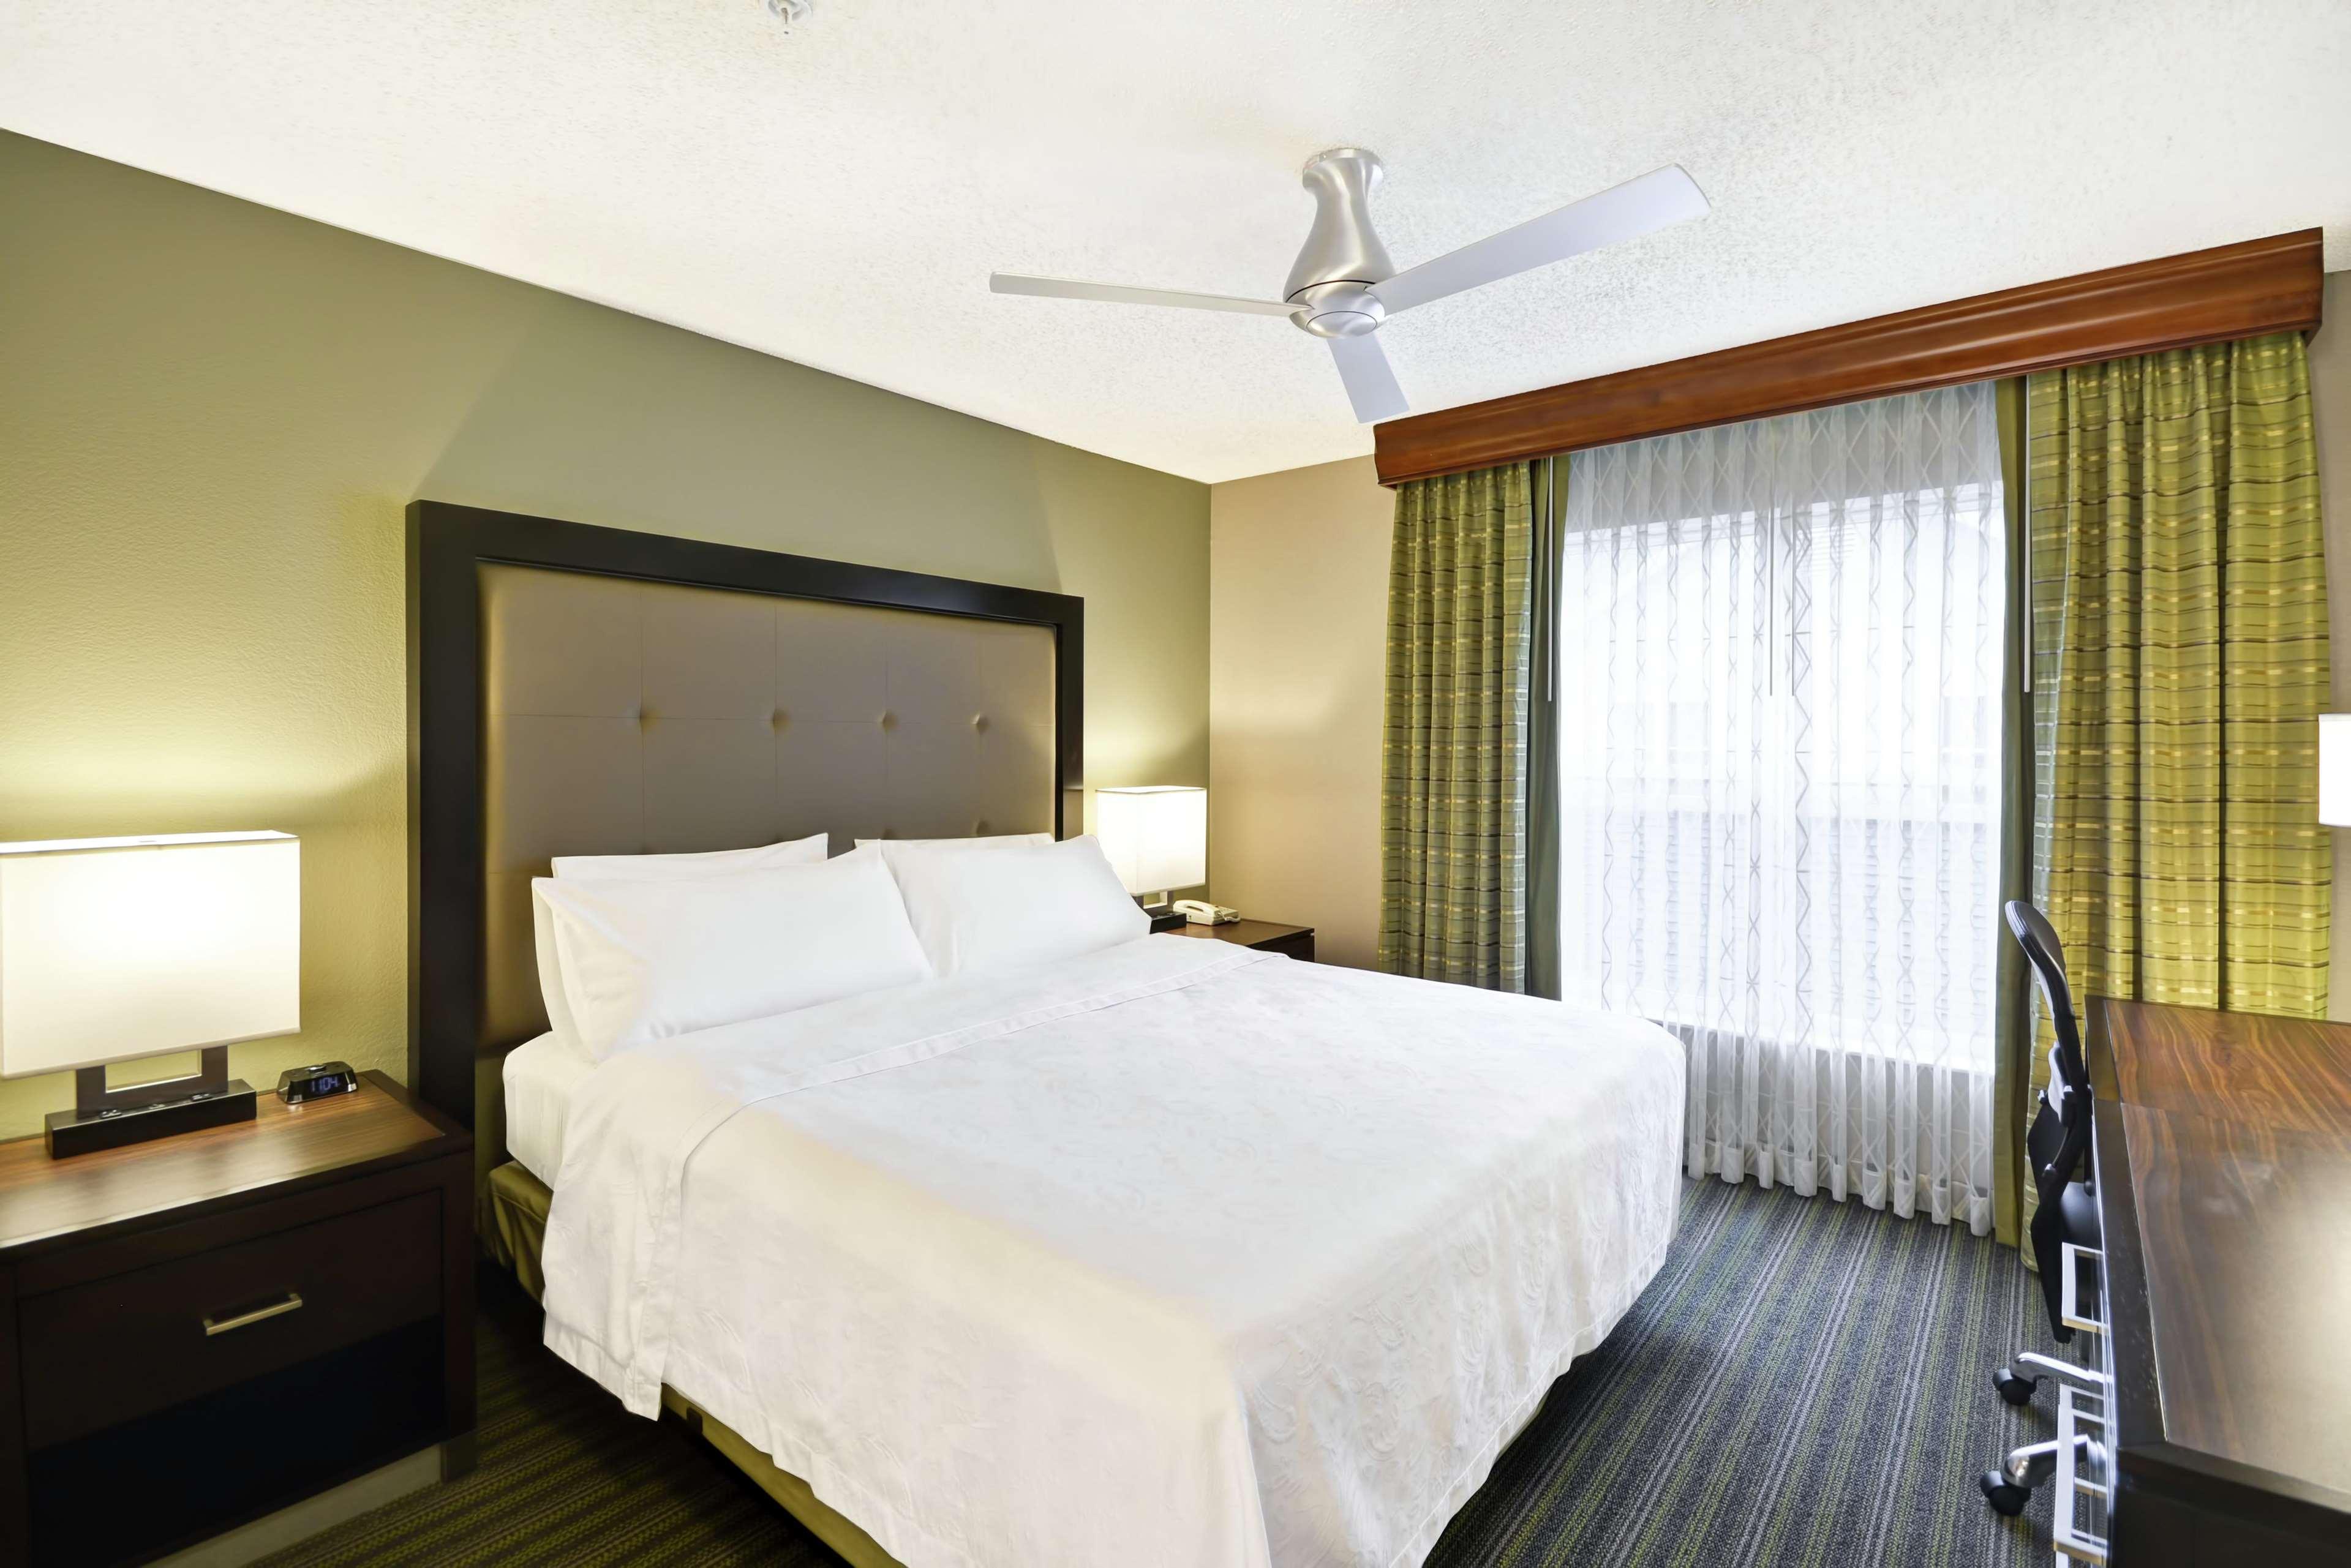 Homewood Suites by Hilton Hillsboro/Beaverton